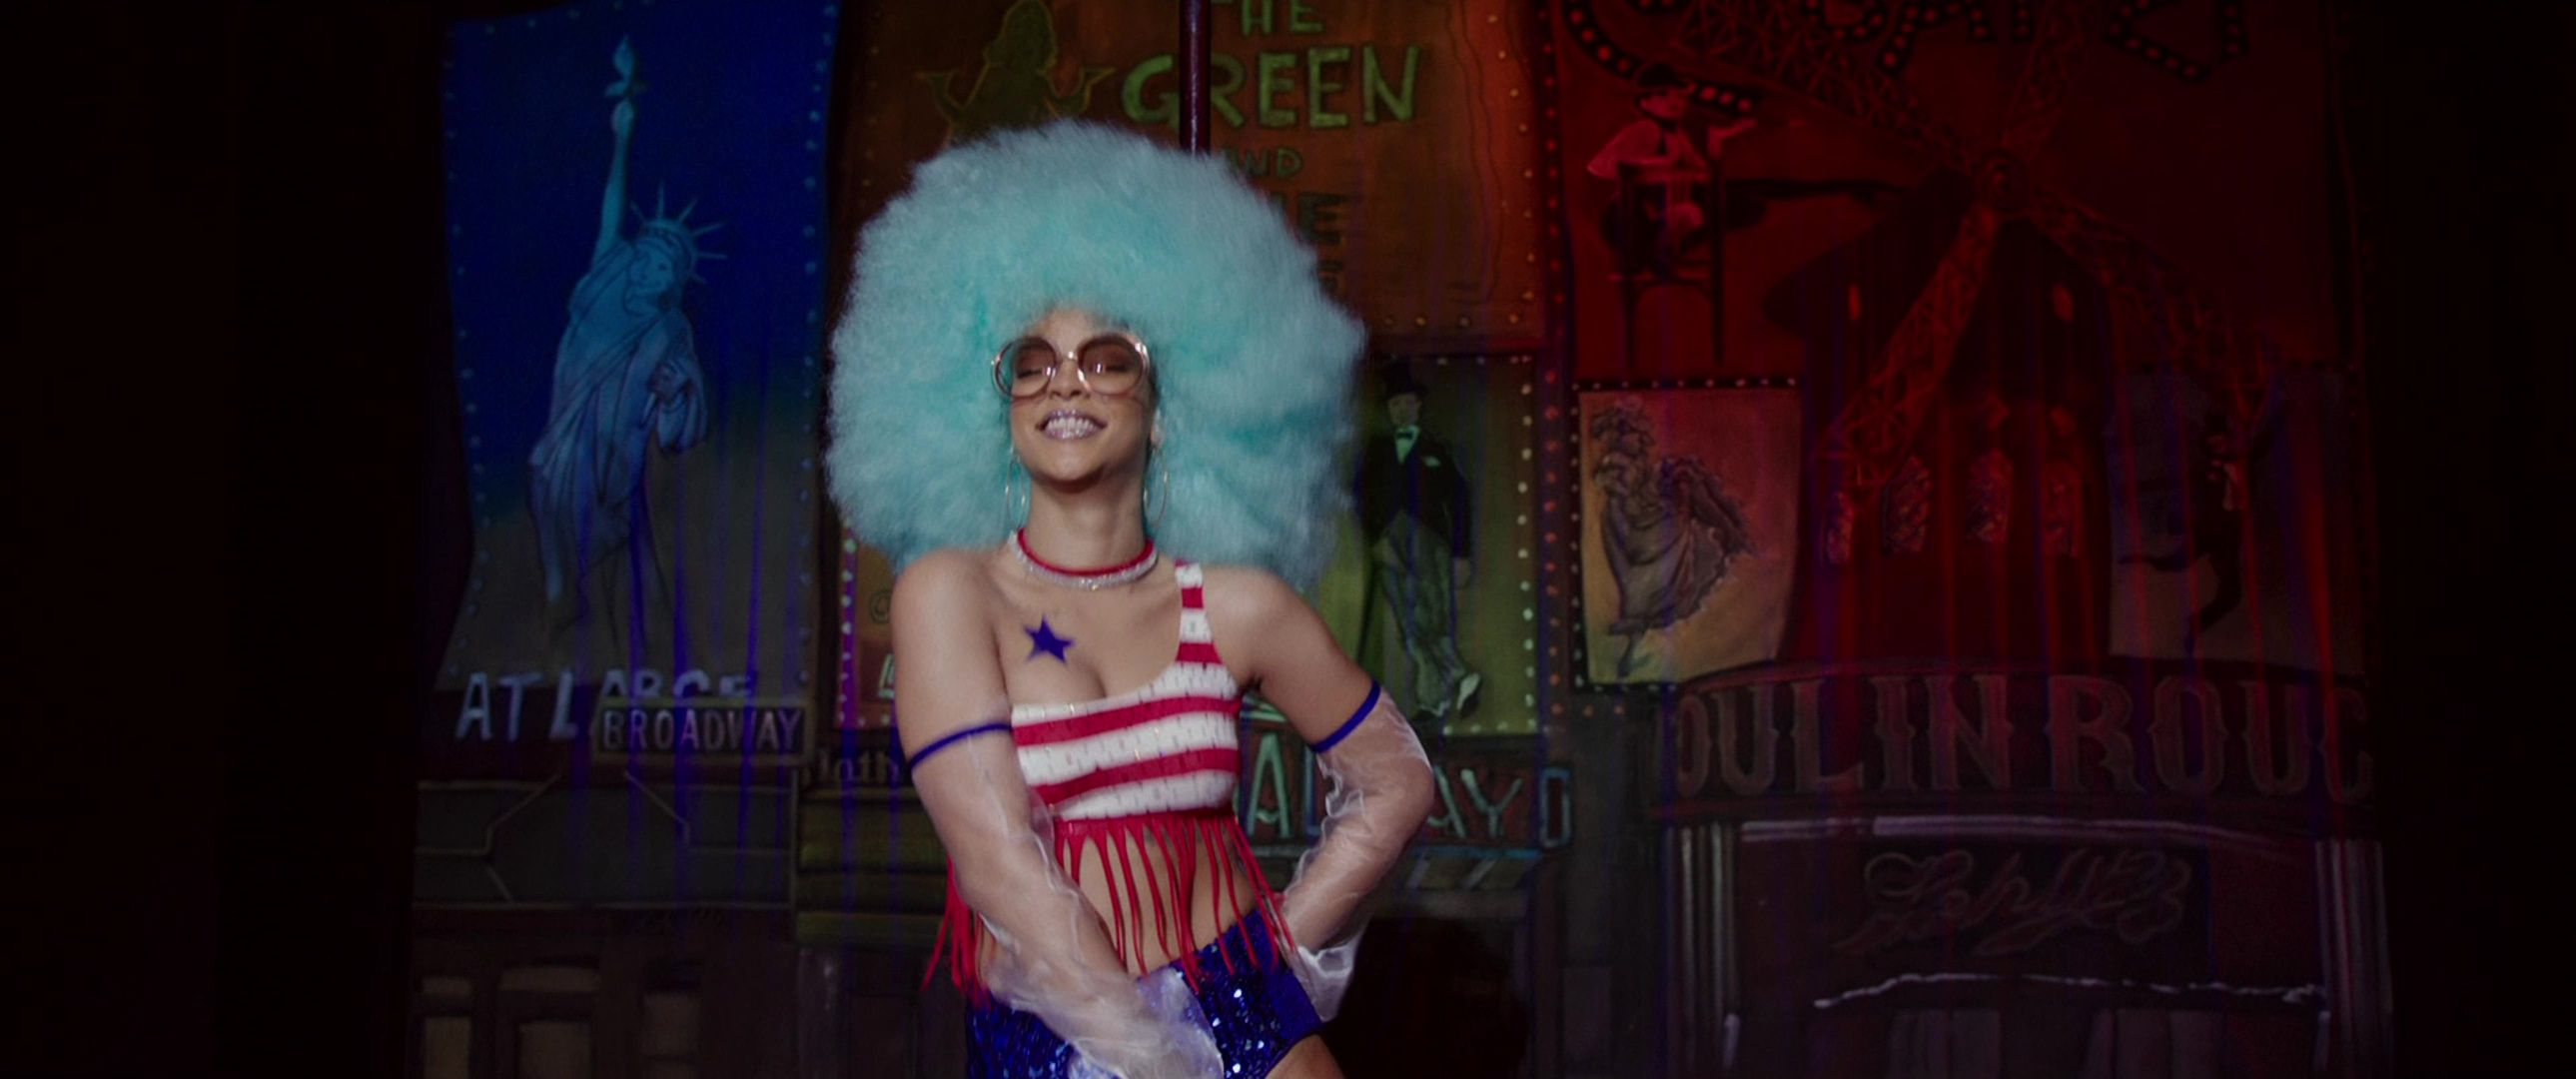 Rihanna-Sexy-37-thefappeningblog.com_.jpg